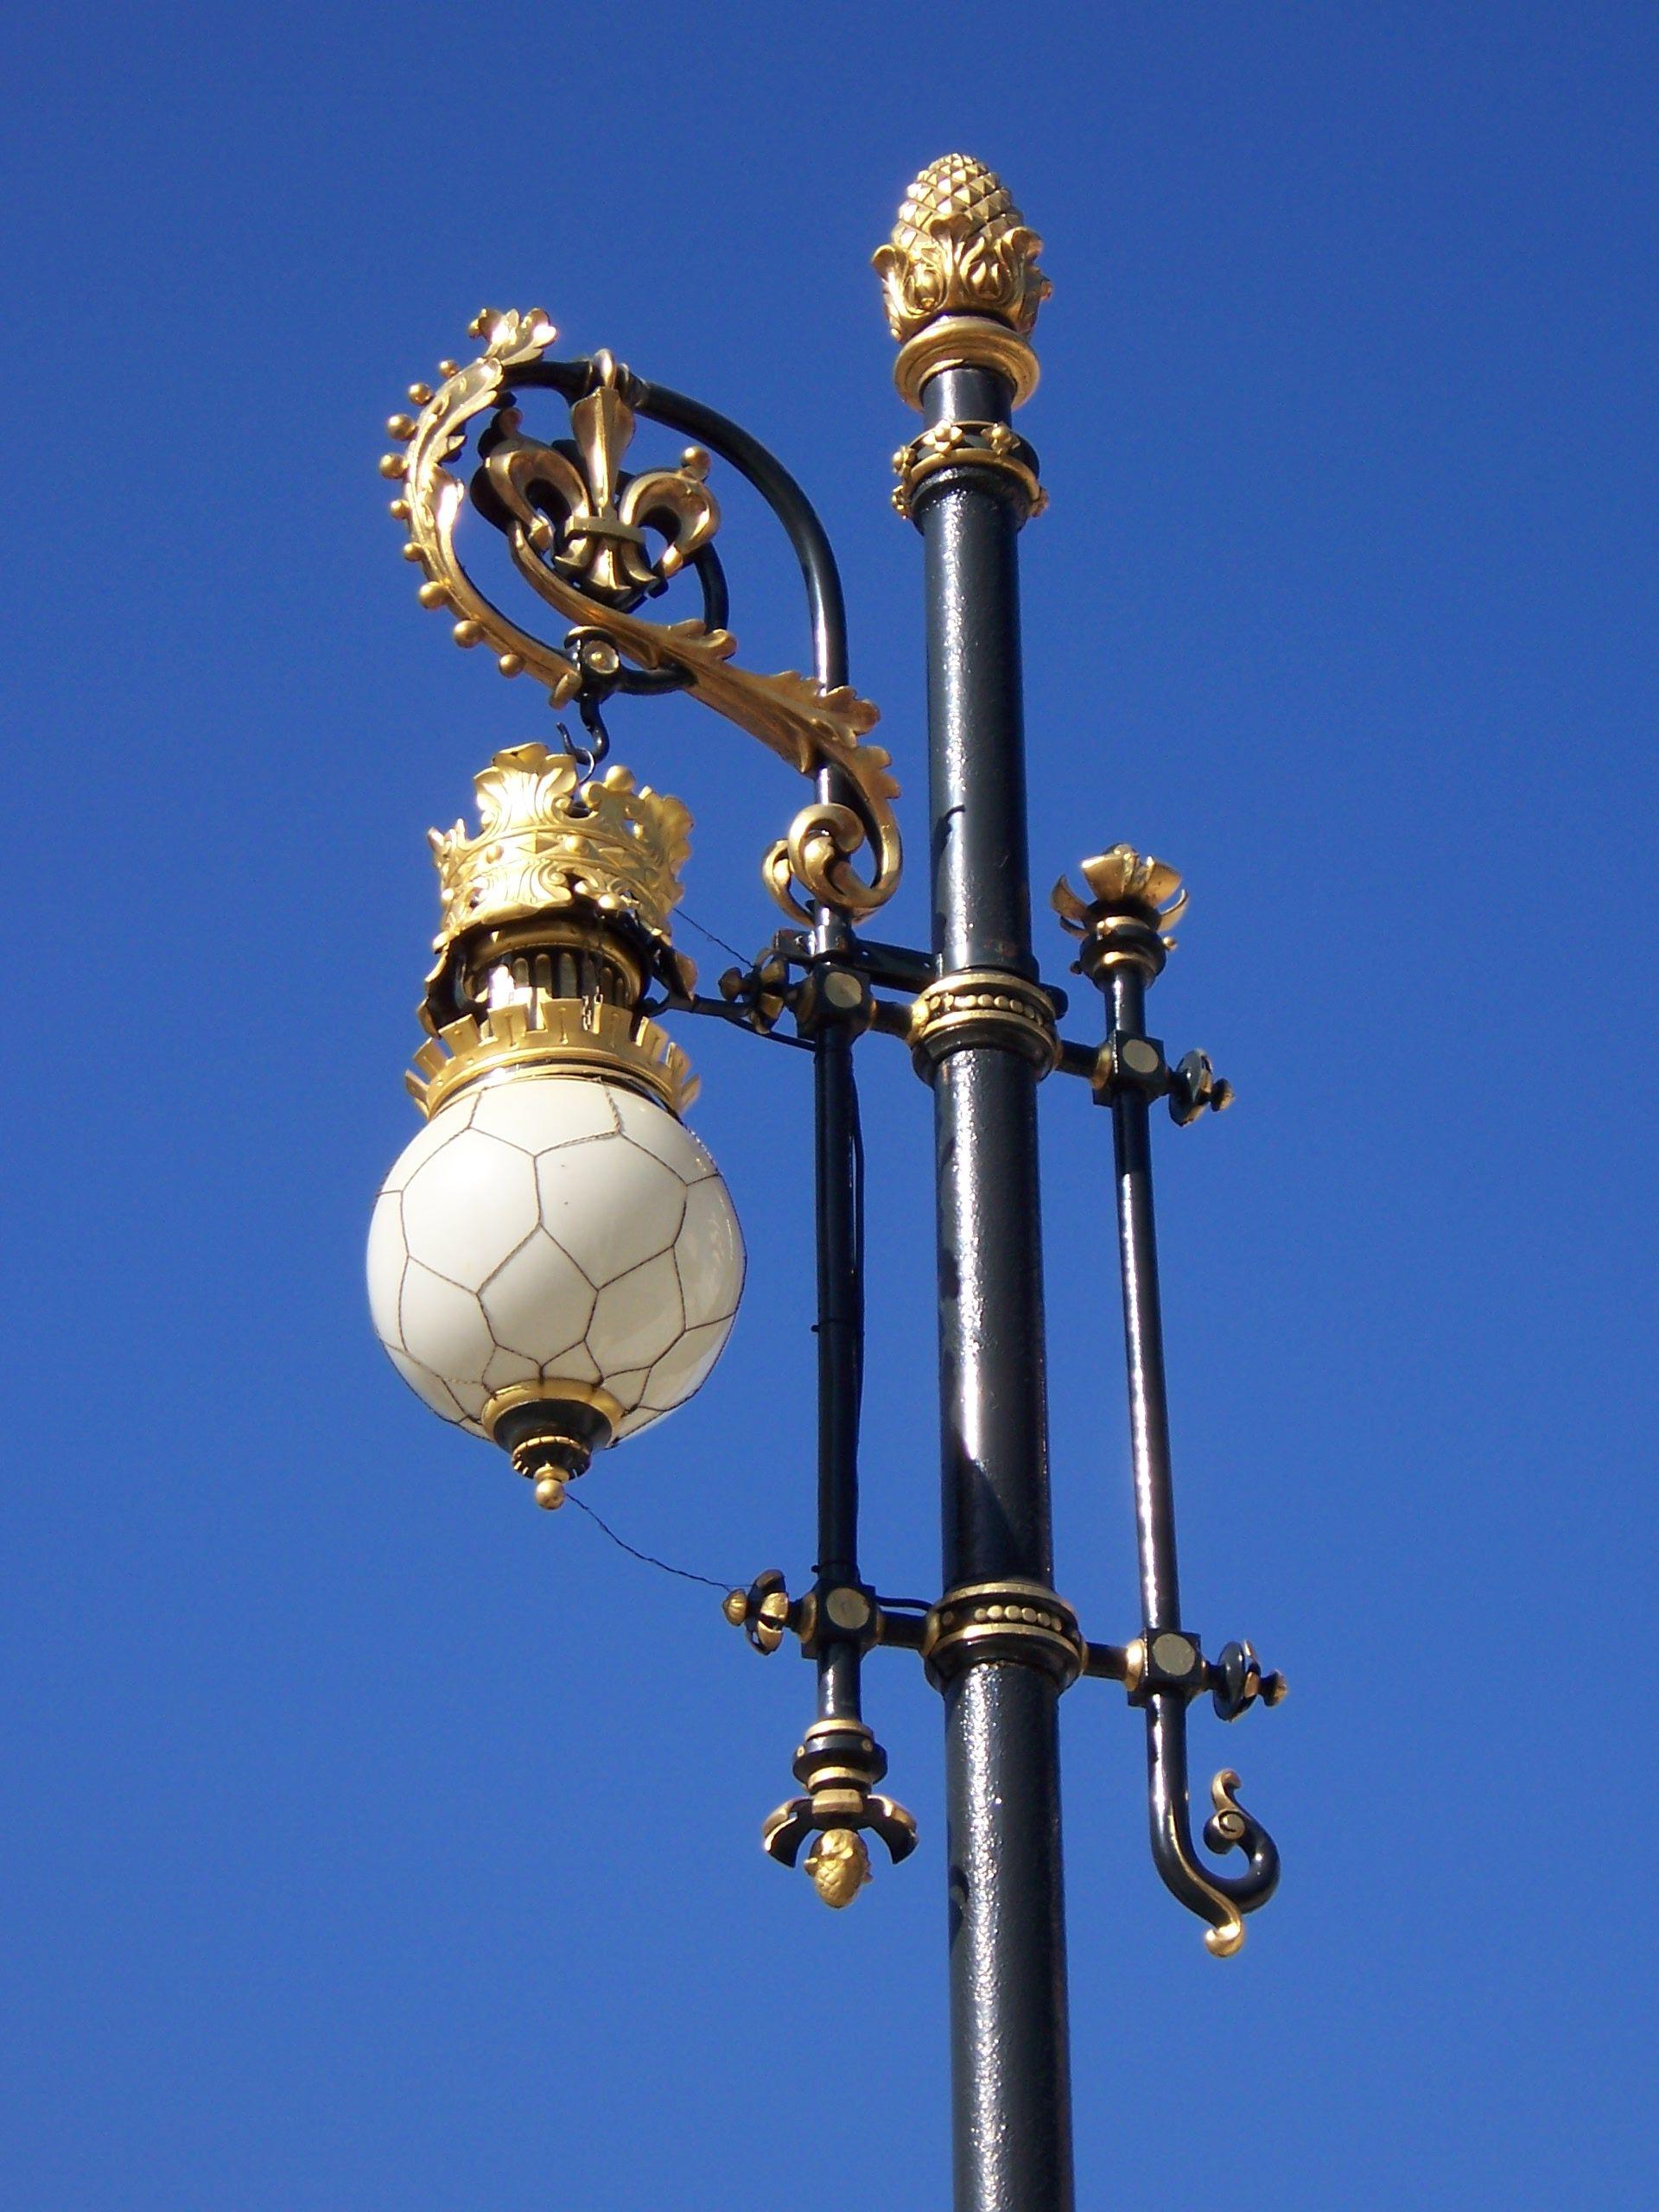 Lampione di Madrid